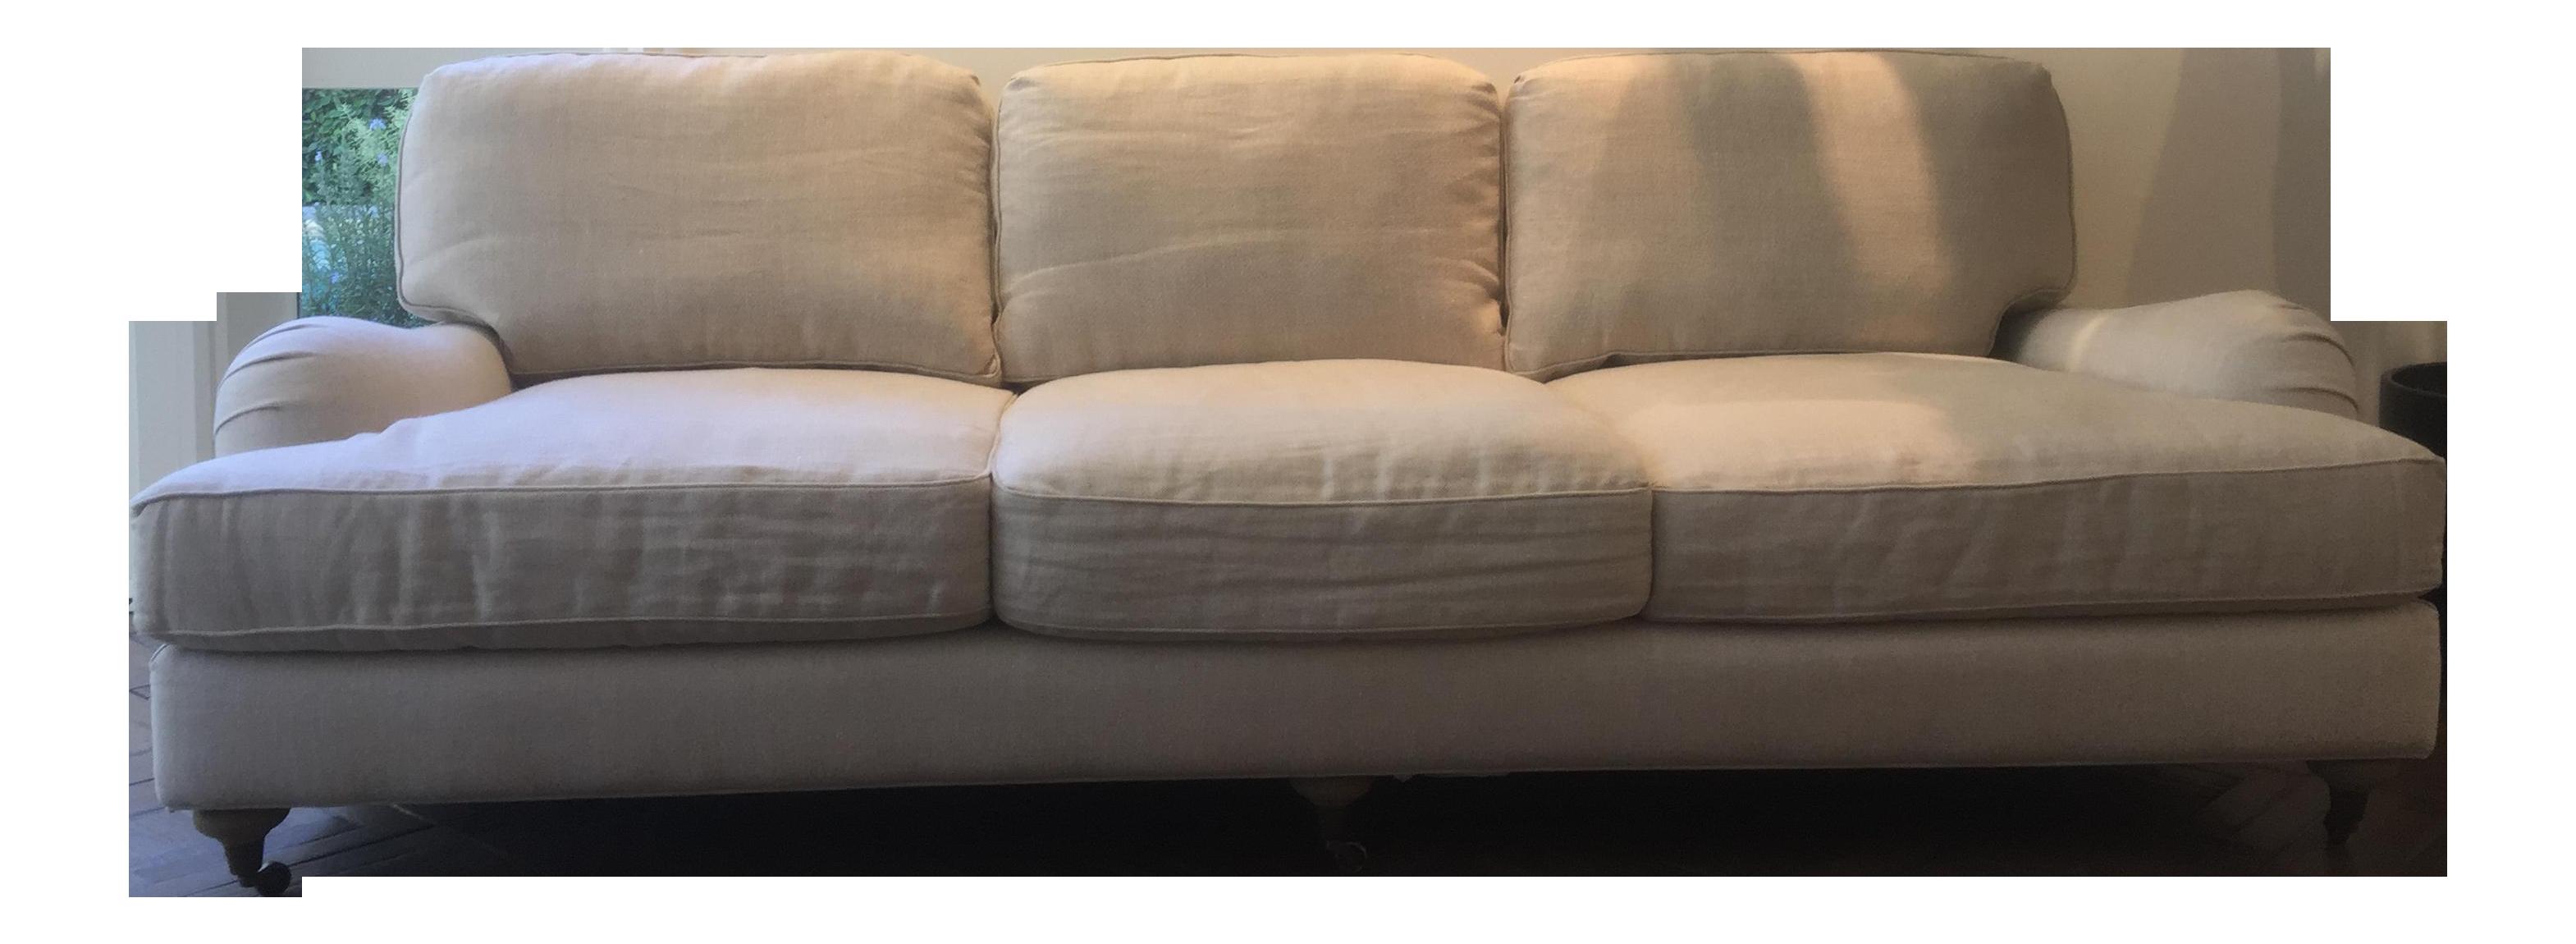 Restoration Hardware Belgian Linen Sofa Chairish